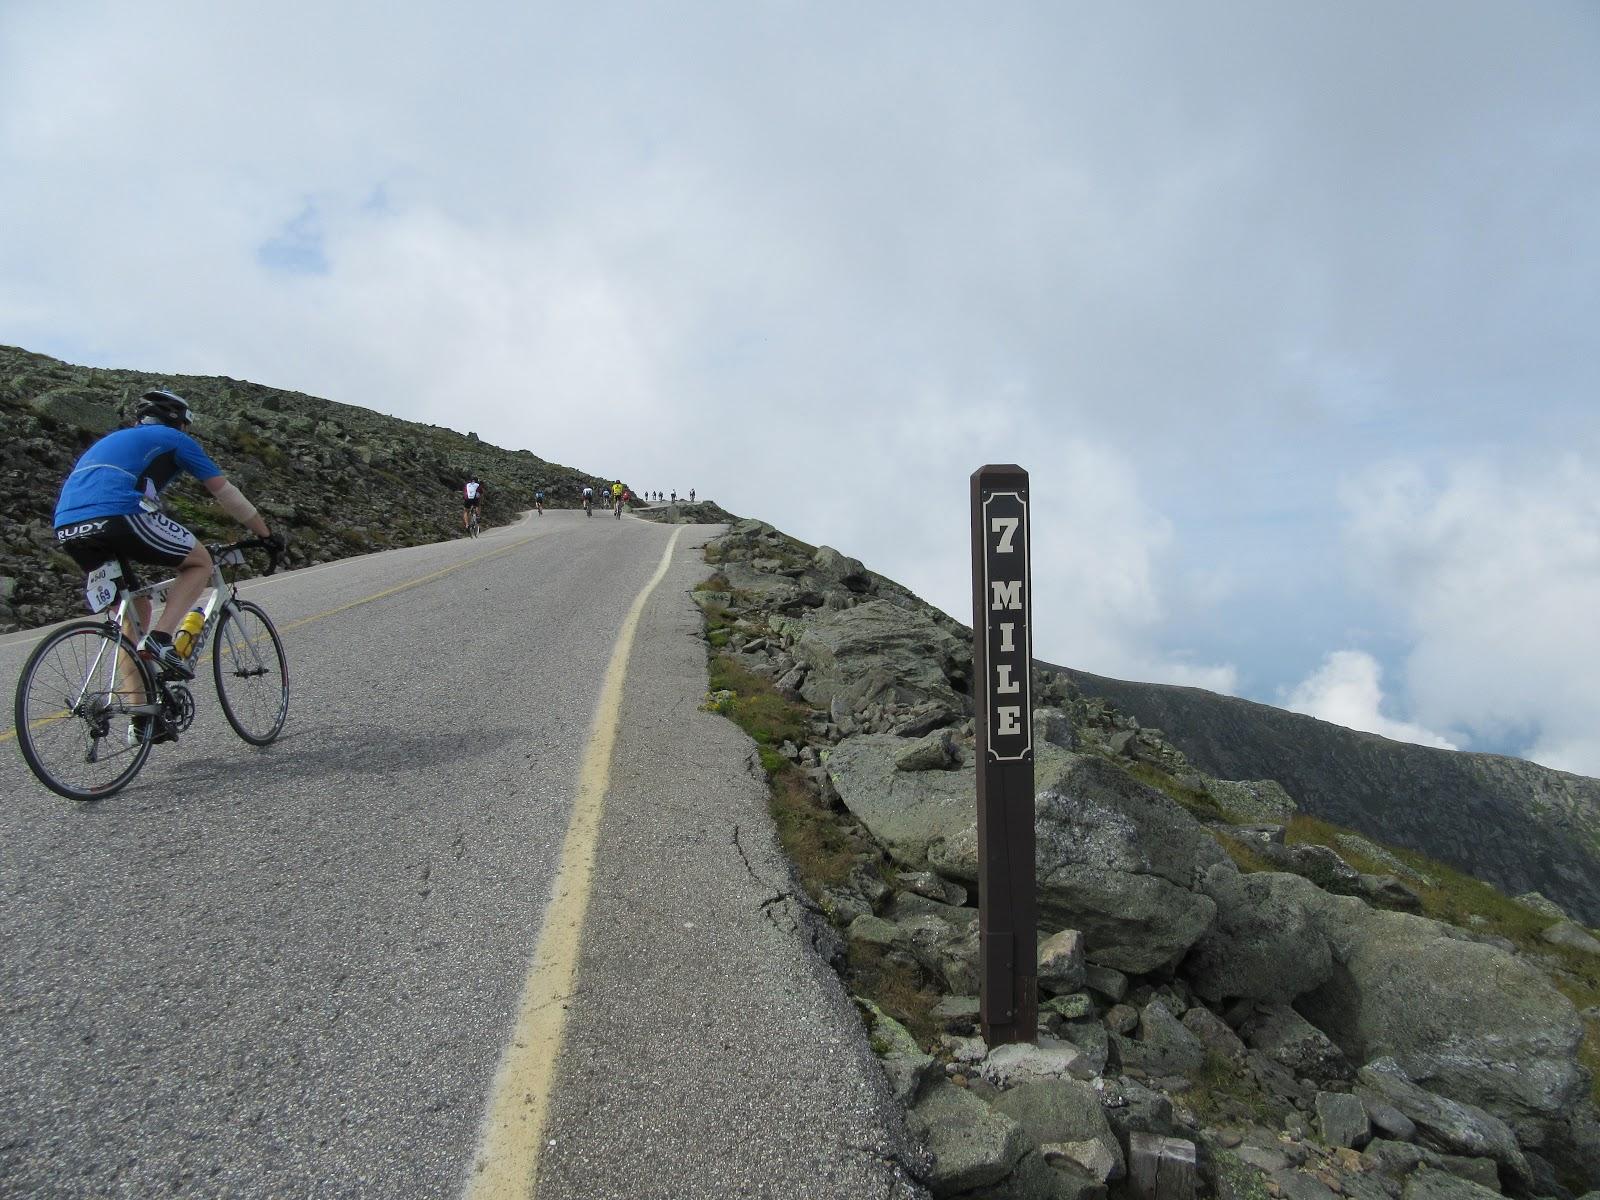 Racing Mt. Washington Auto Road - 7 mile marker